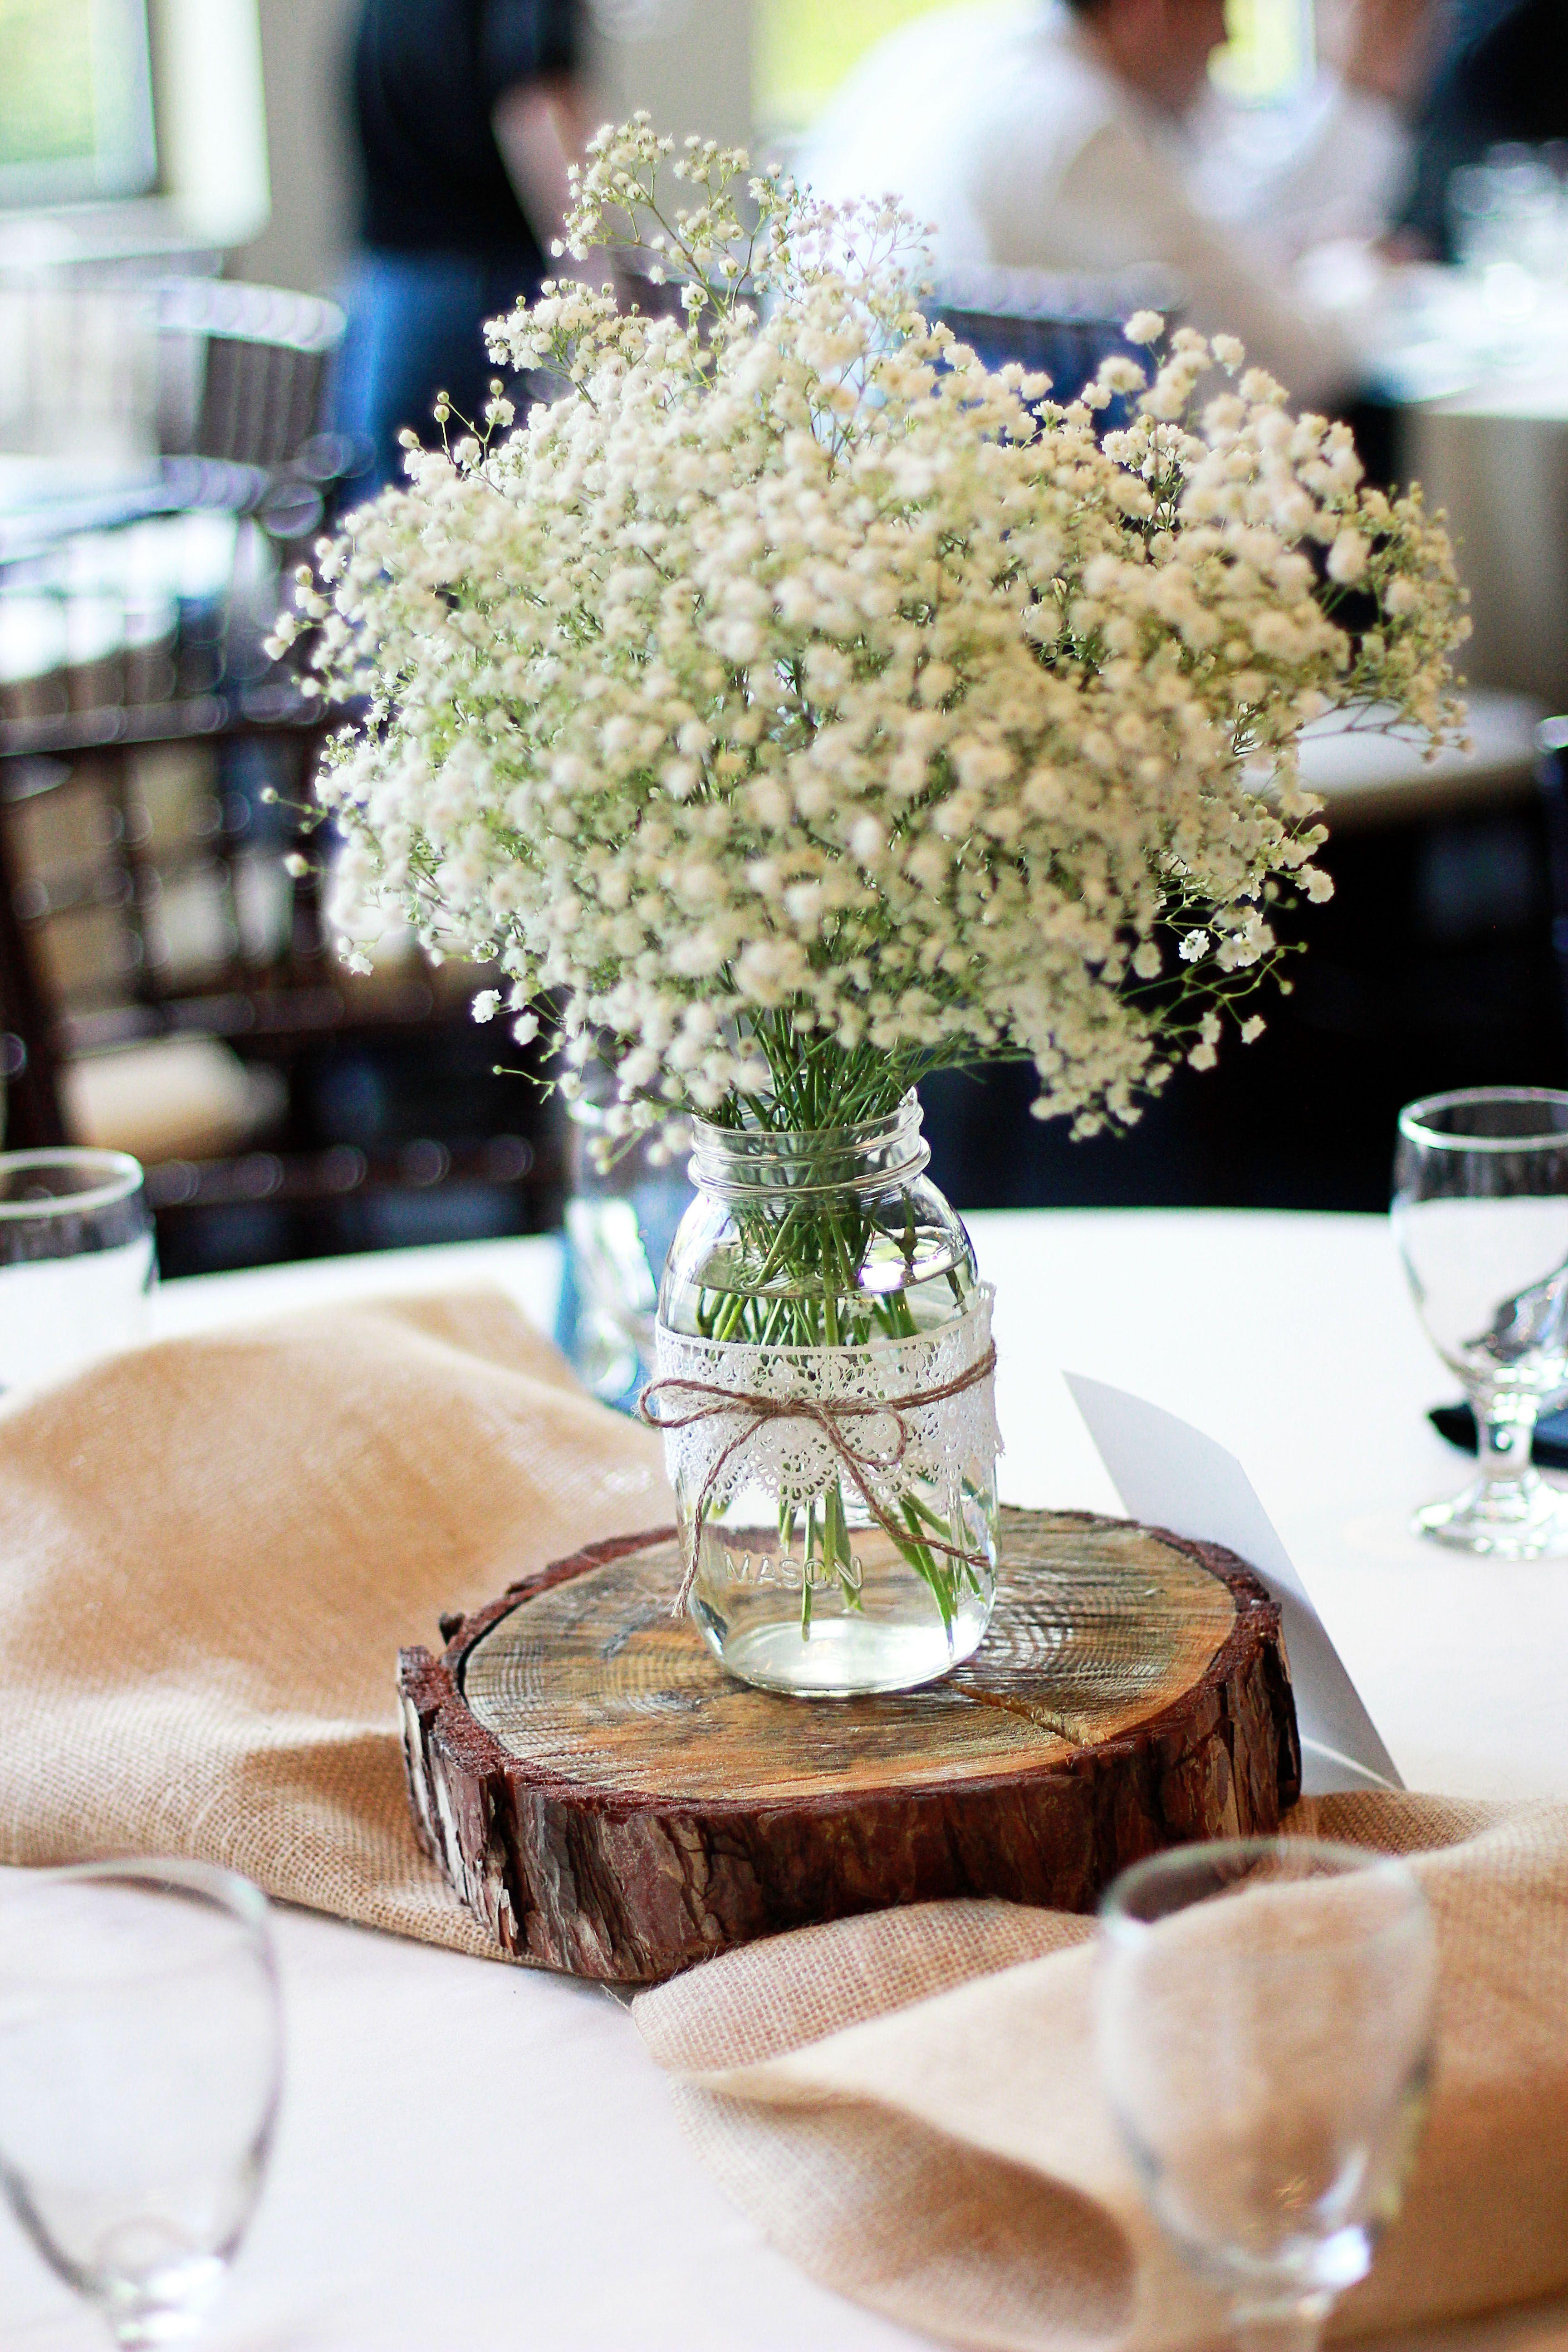 Baby Breath For Your Wedding 50 Ideas Bridal Shower Rustic Wedding Centerpieces Mason Jars Babys Breath Centerpiece Wedding